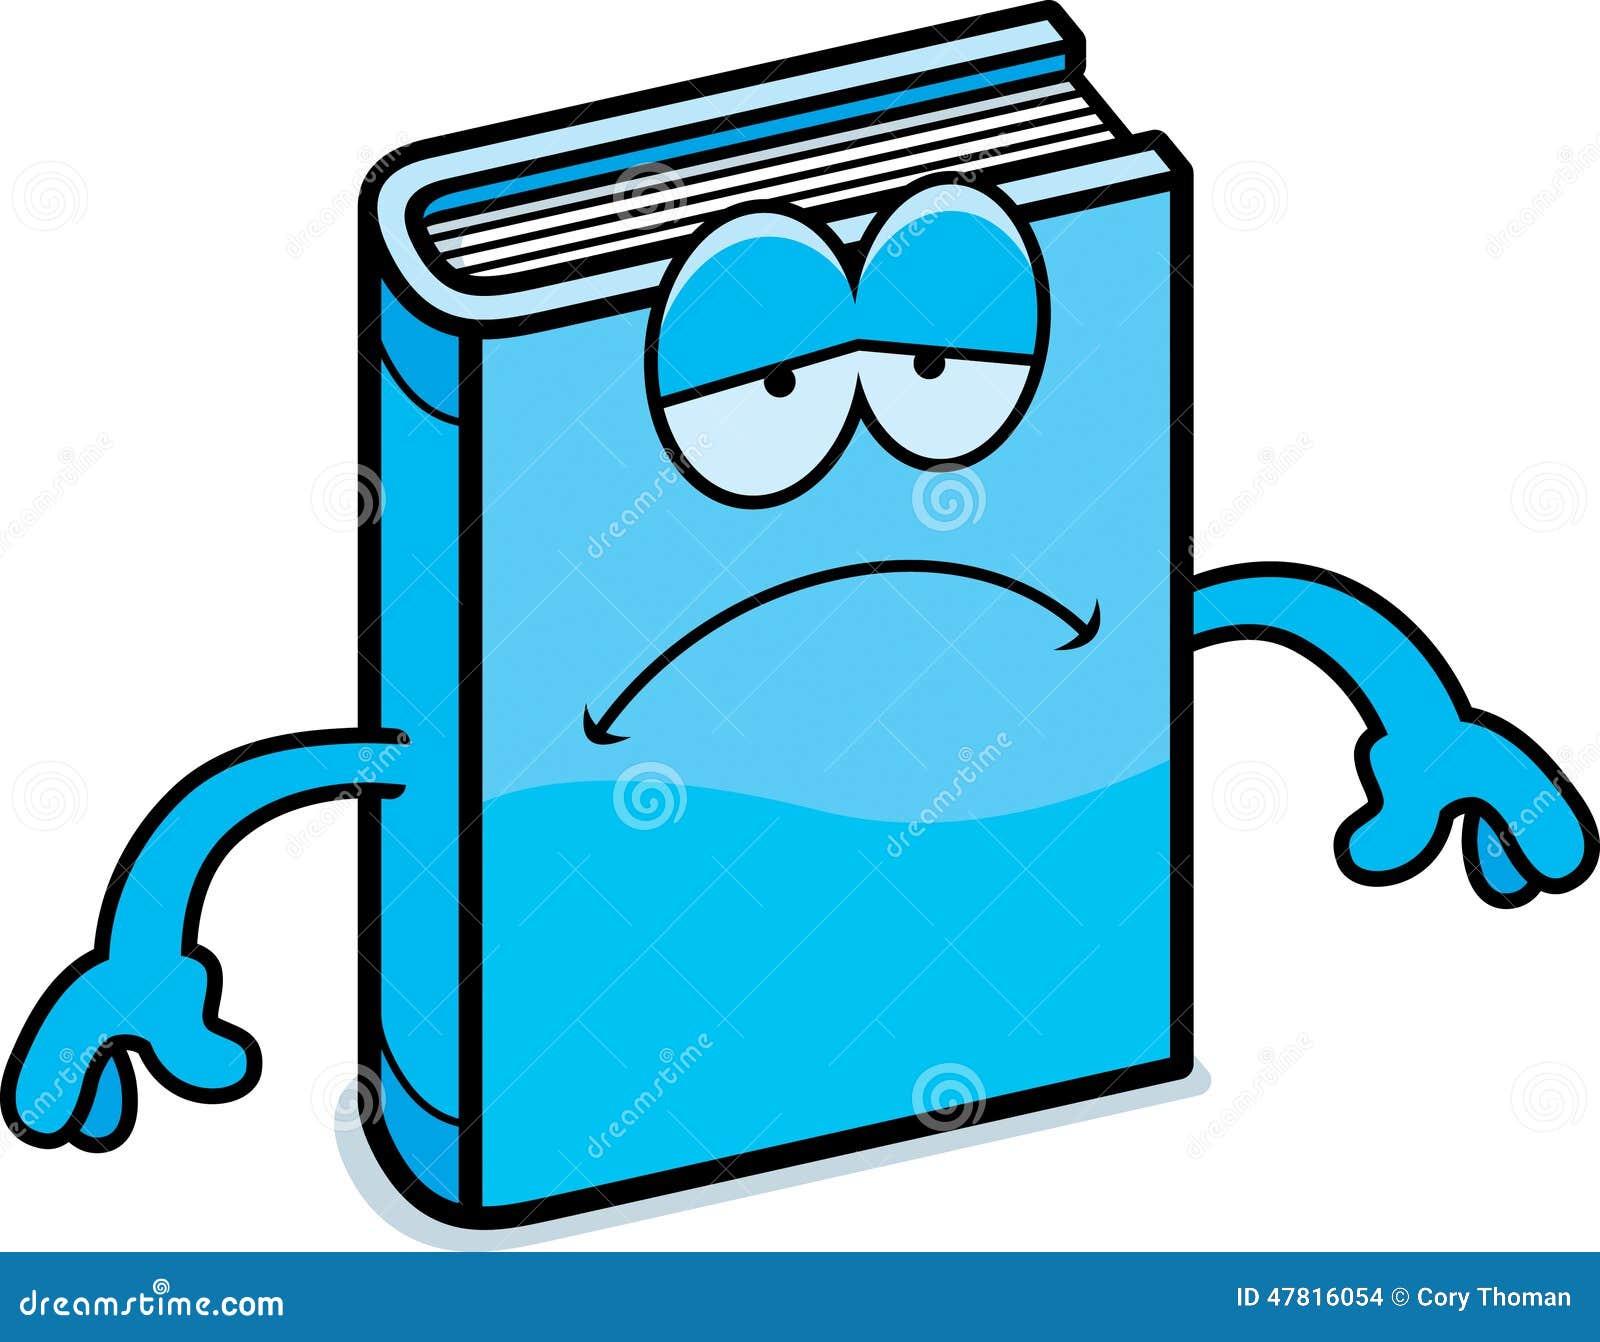 sad cartoon book stock vector illustration of vector frown mouth clipart Frown Mouth Clip Art